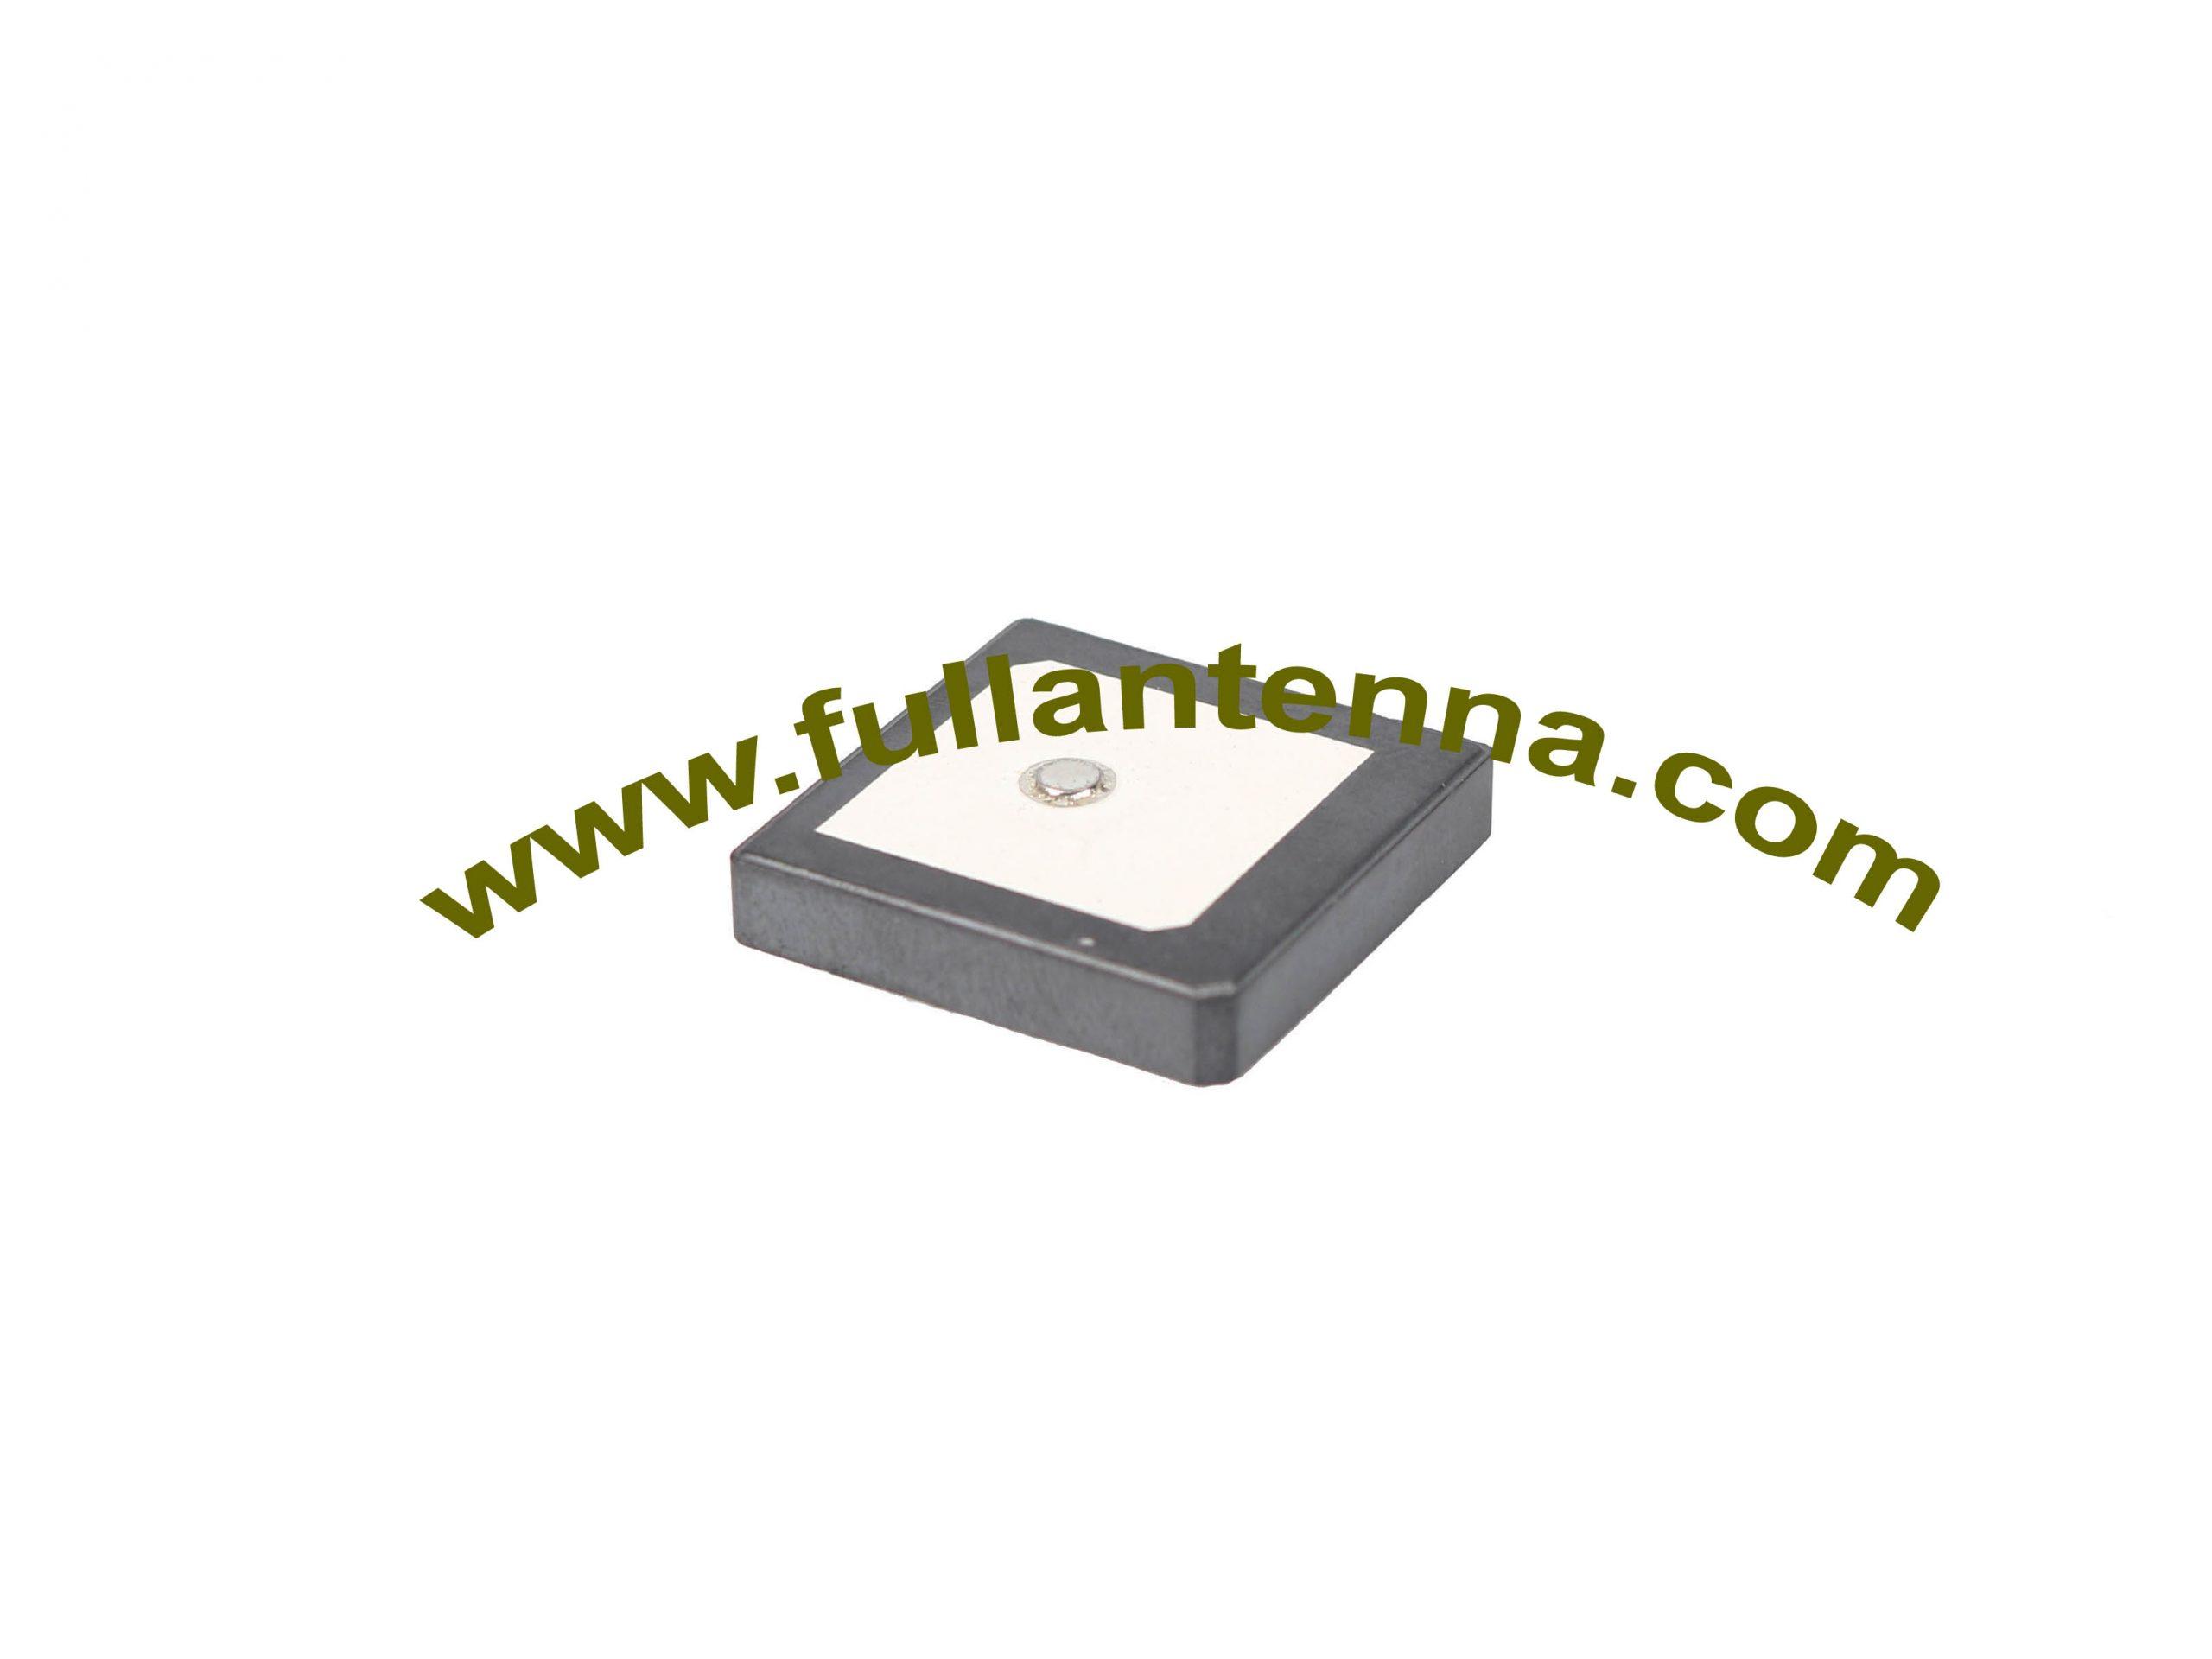 P/N:FAGPS.204,GPS Dielectric Antenna,gps patch antenna 20x20x4mm size pin mount